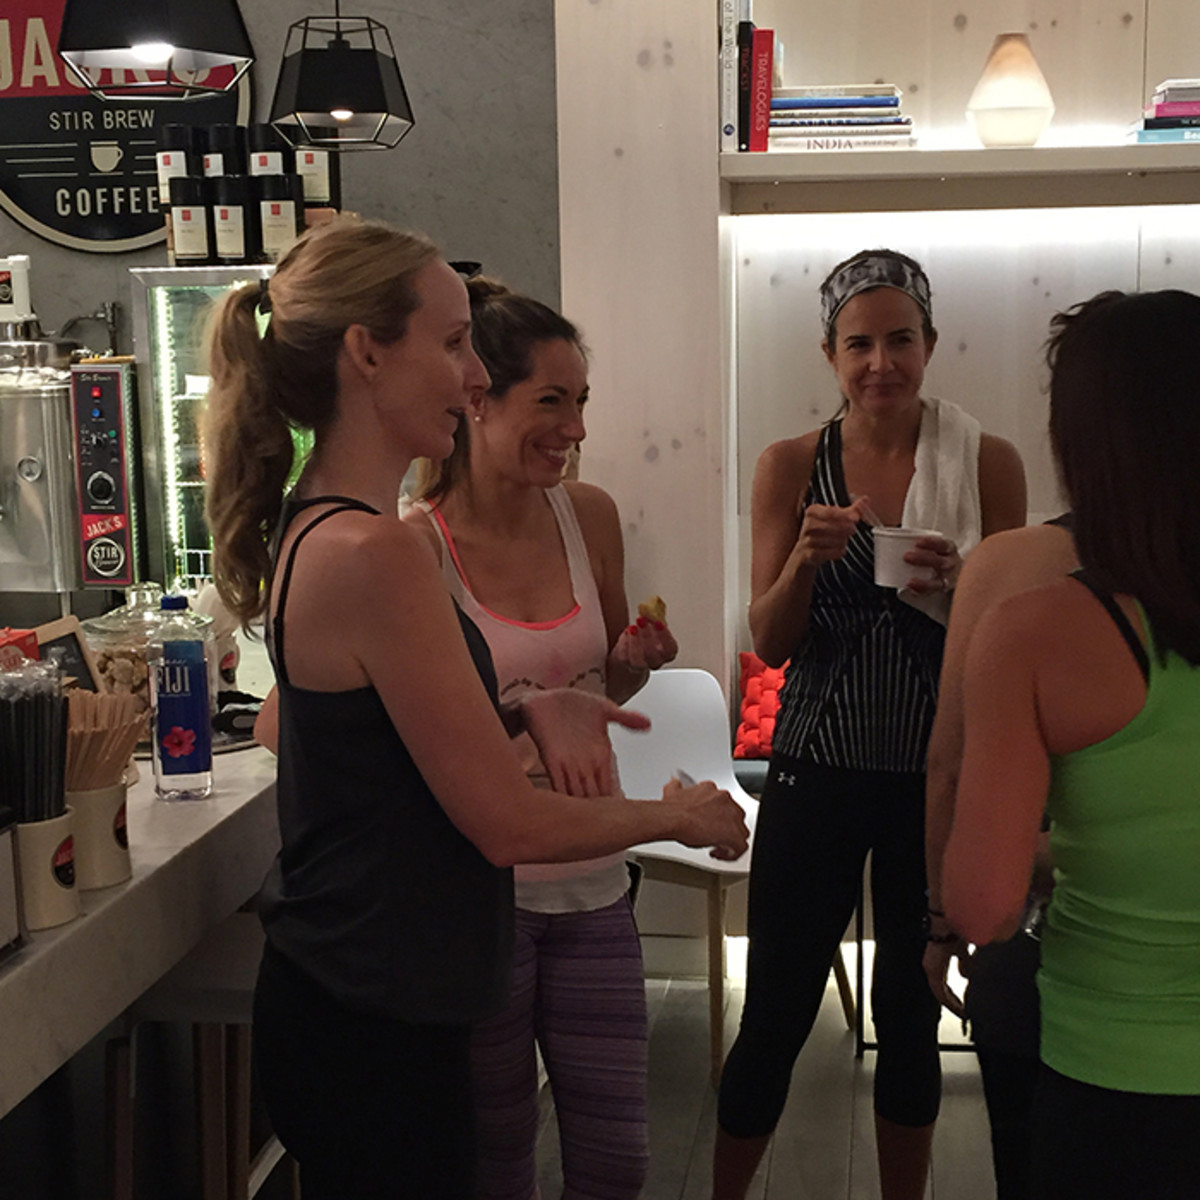 bloggers mingling